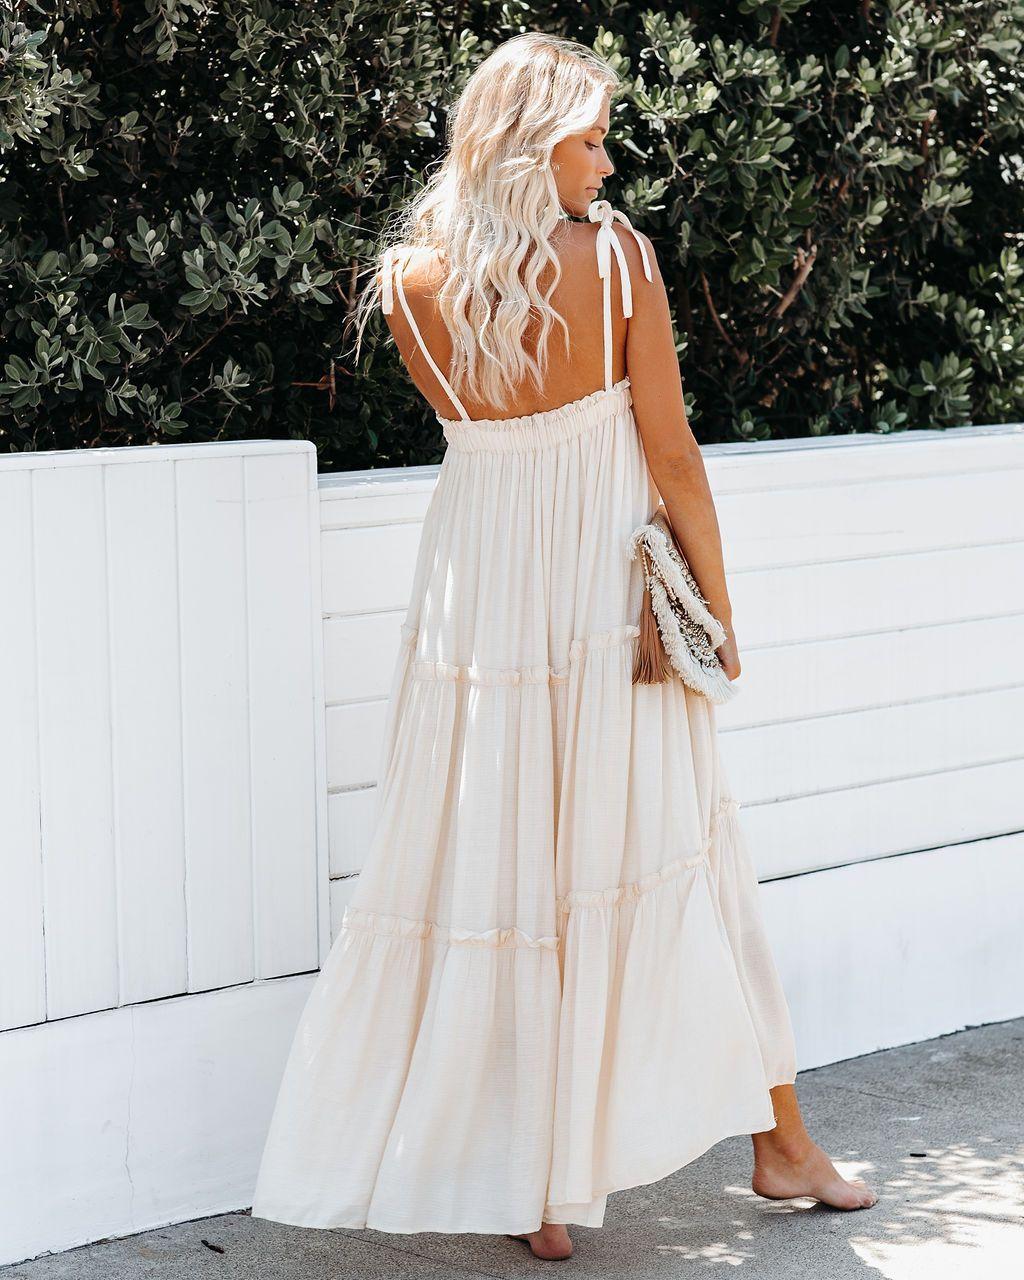 Catch The Sun Pocketed Tiered Maxi Dress Eggshell Vici White Maxi Dress Boho Tiered Maxi Dress Beachy Maxi Dress [ 1280 x 1024 Pixel ]